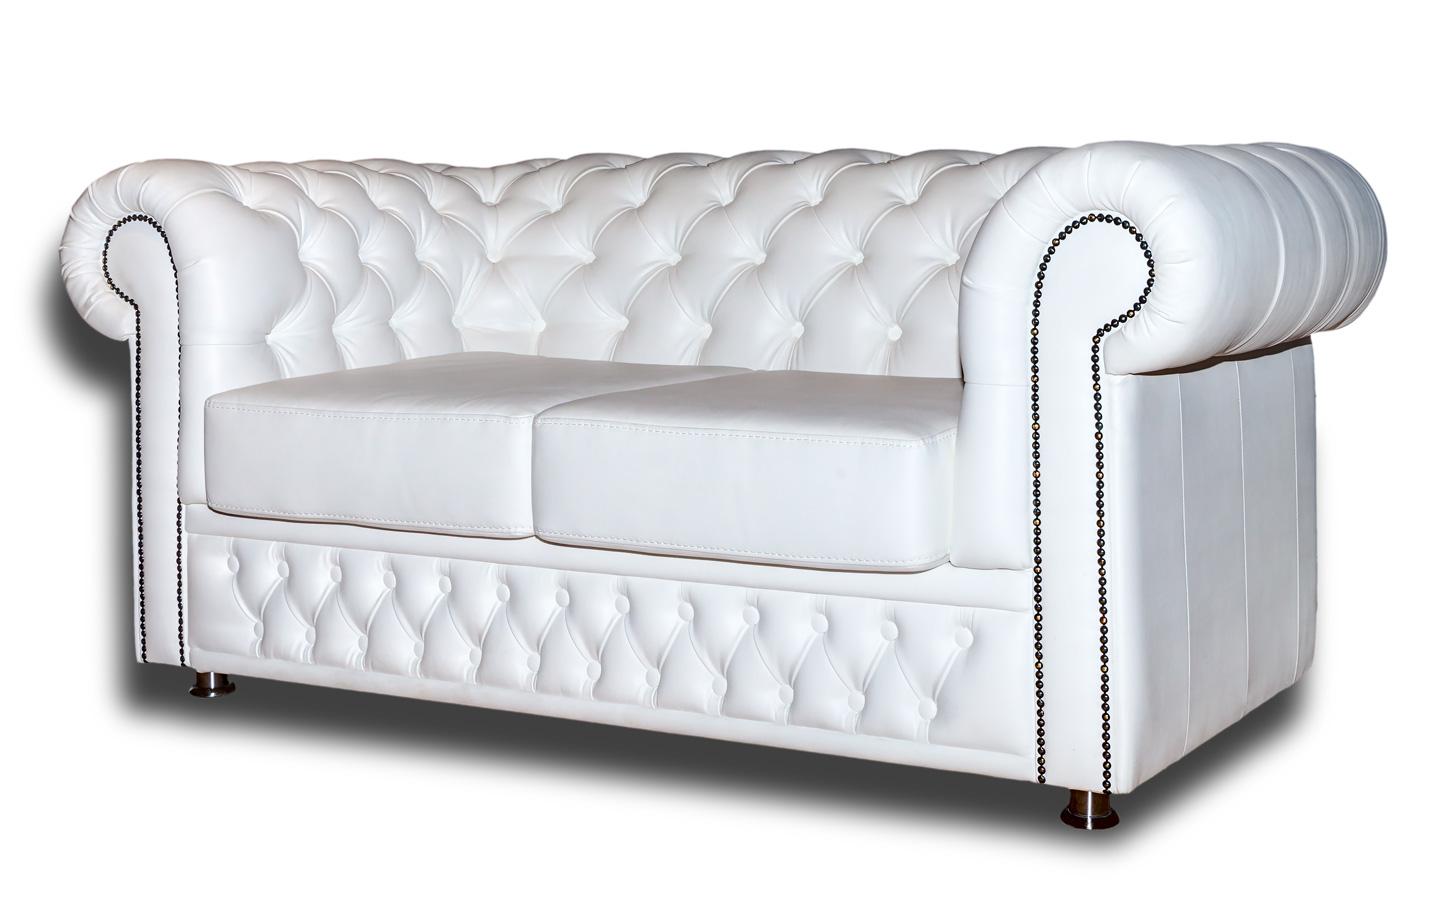 Экспертиза мебели на фенол